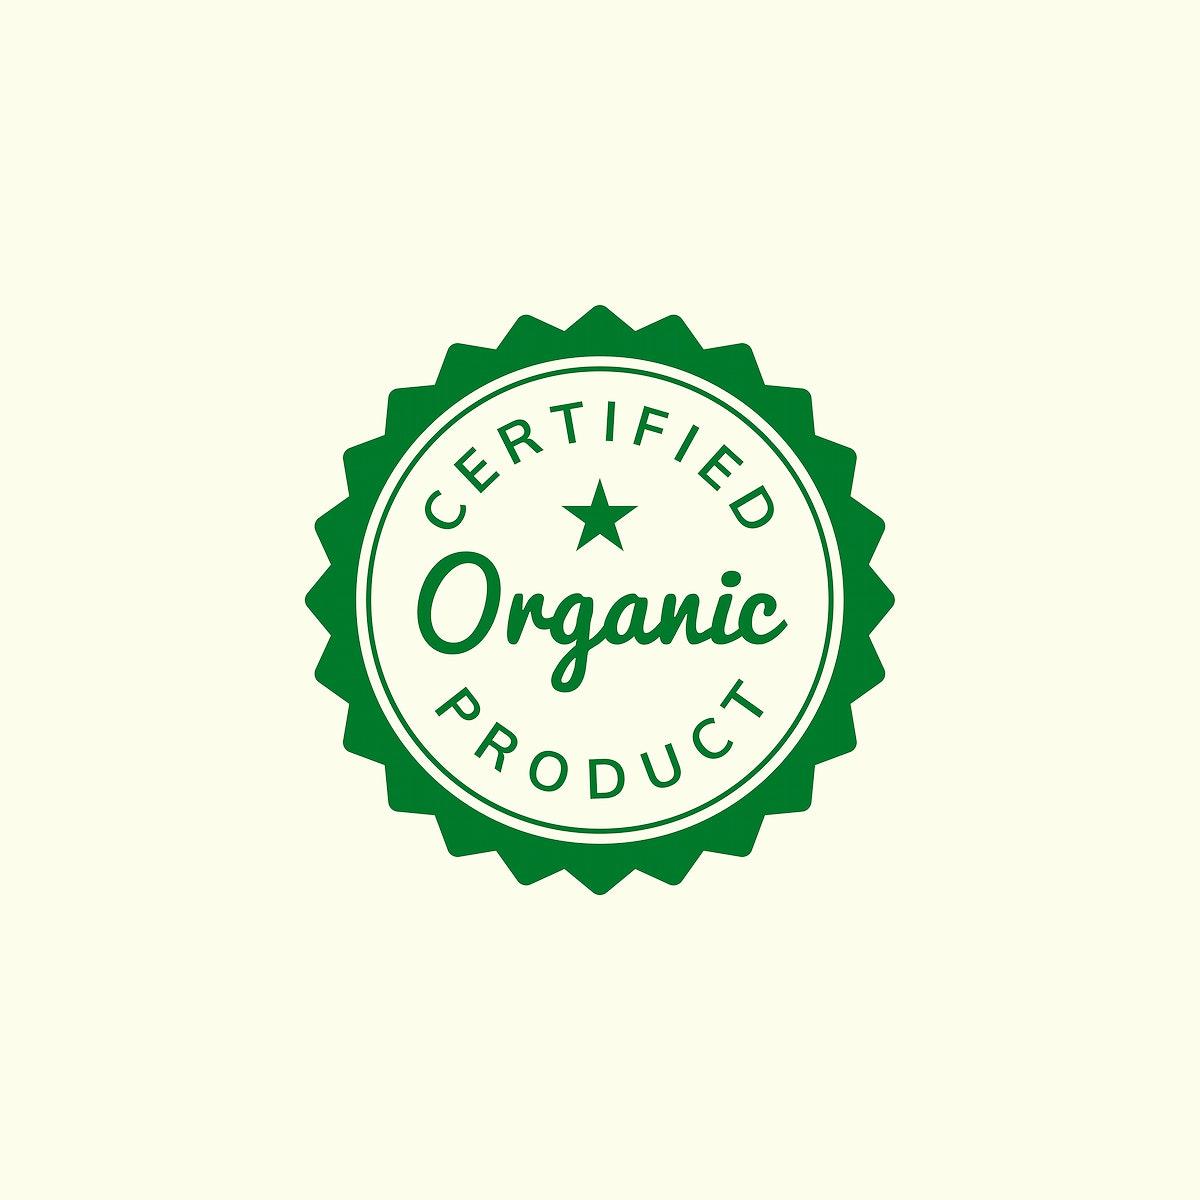 Certified organic product stamp emblem ilustration